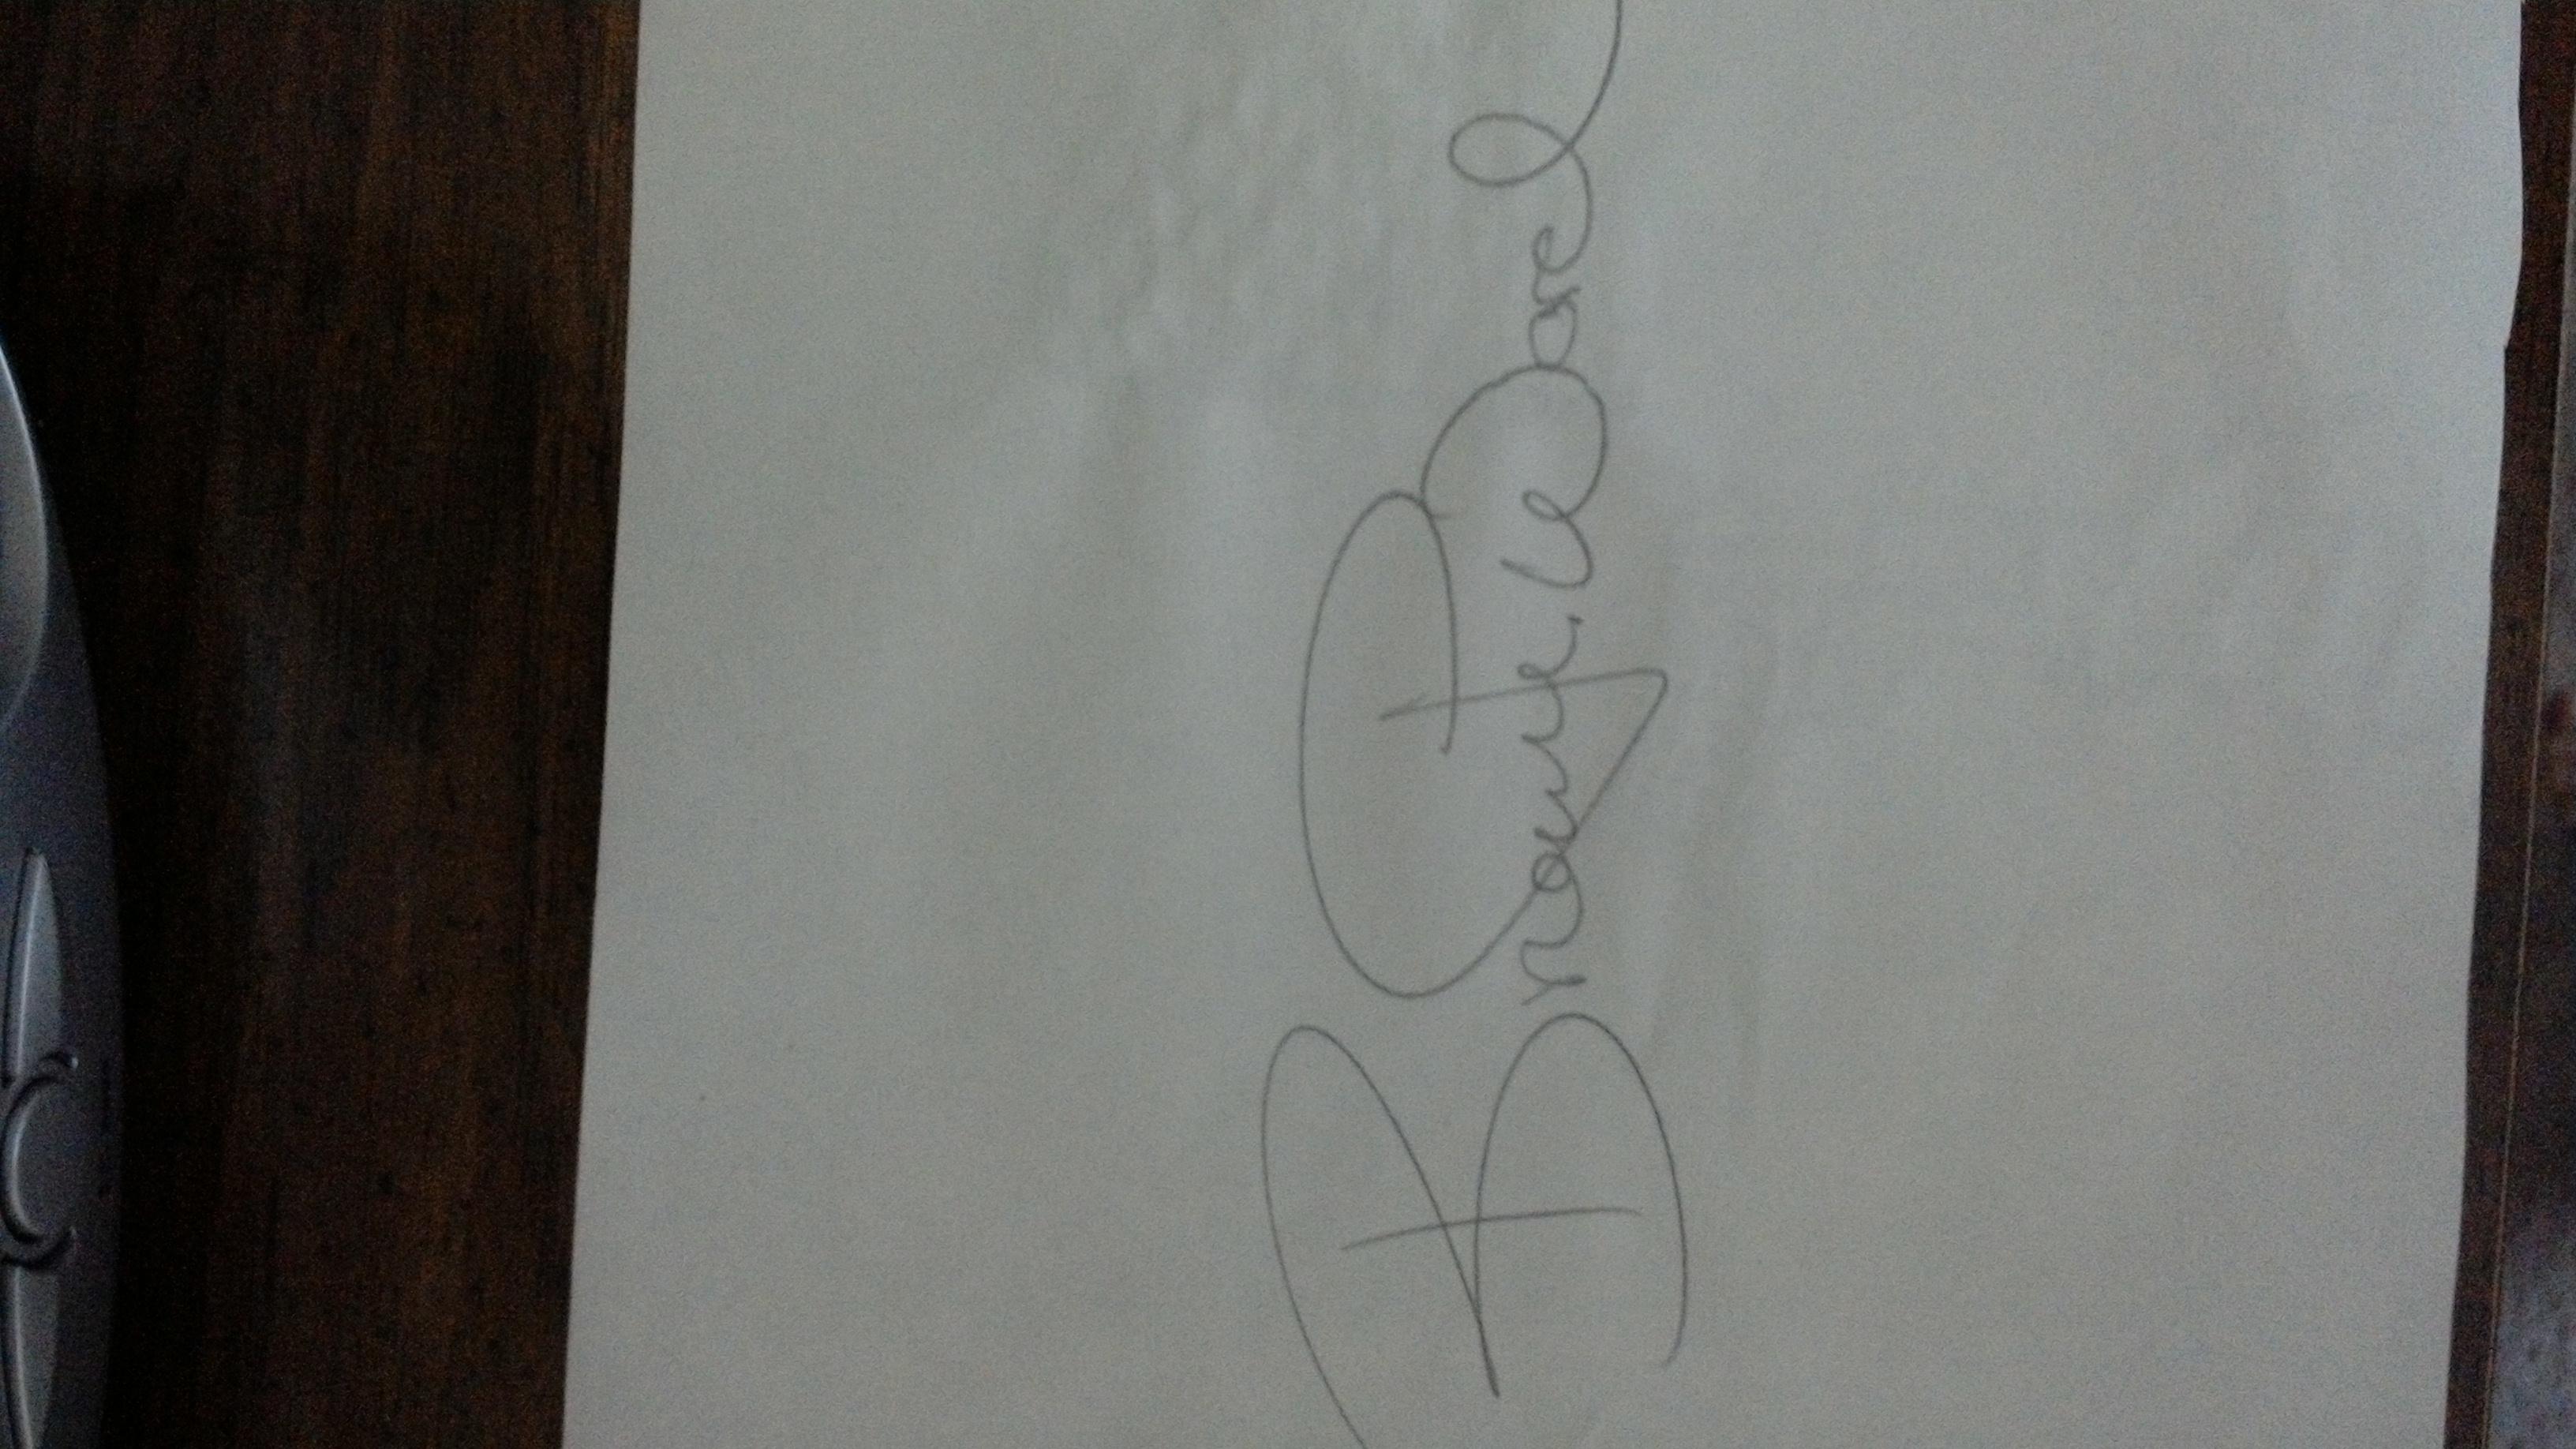 Brieane Pace's Signature